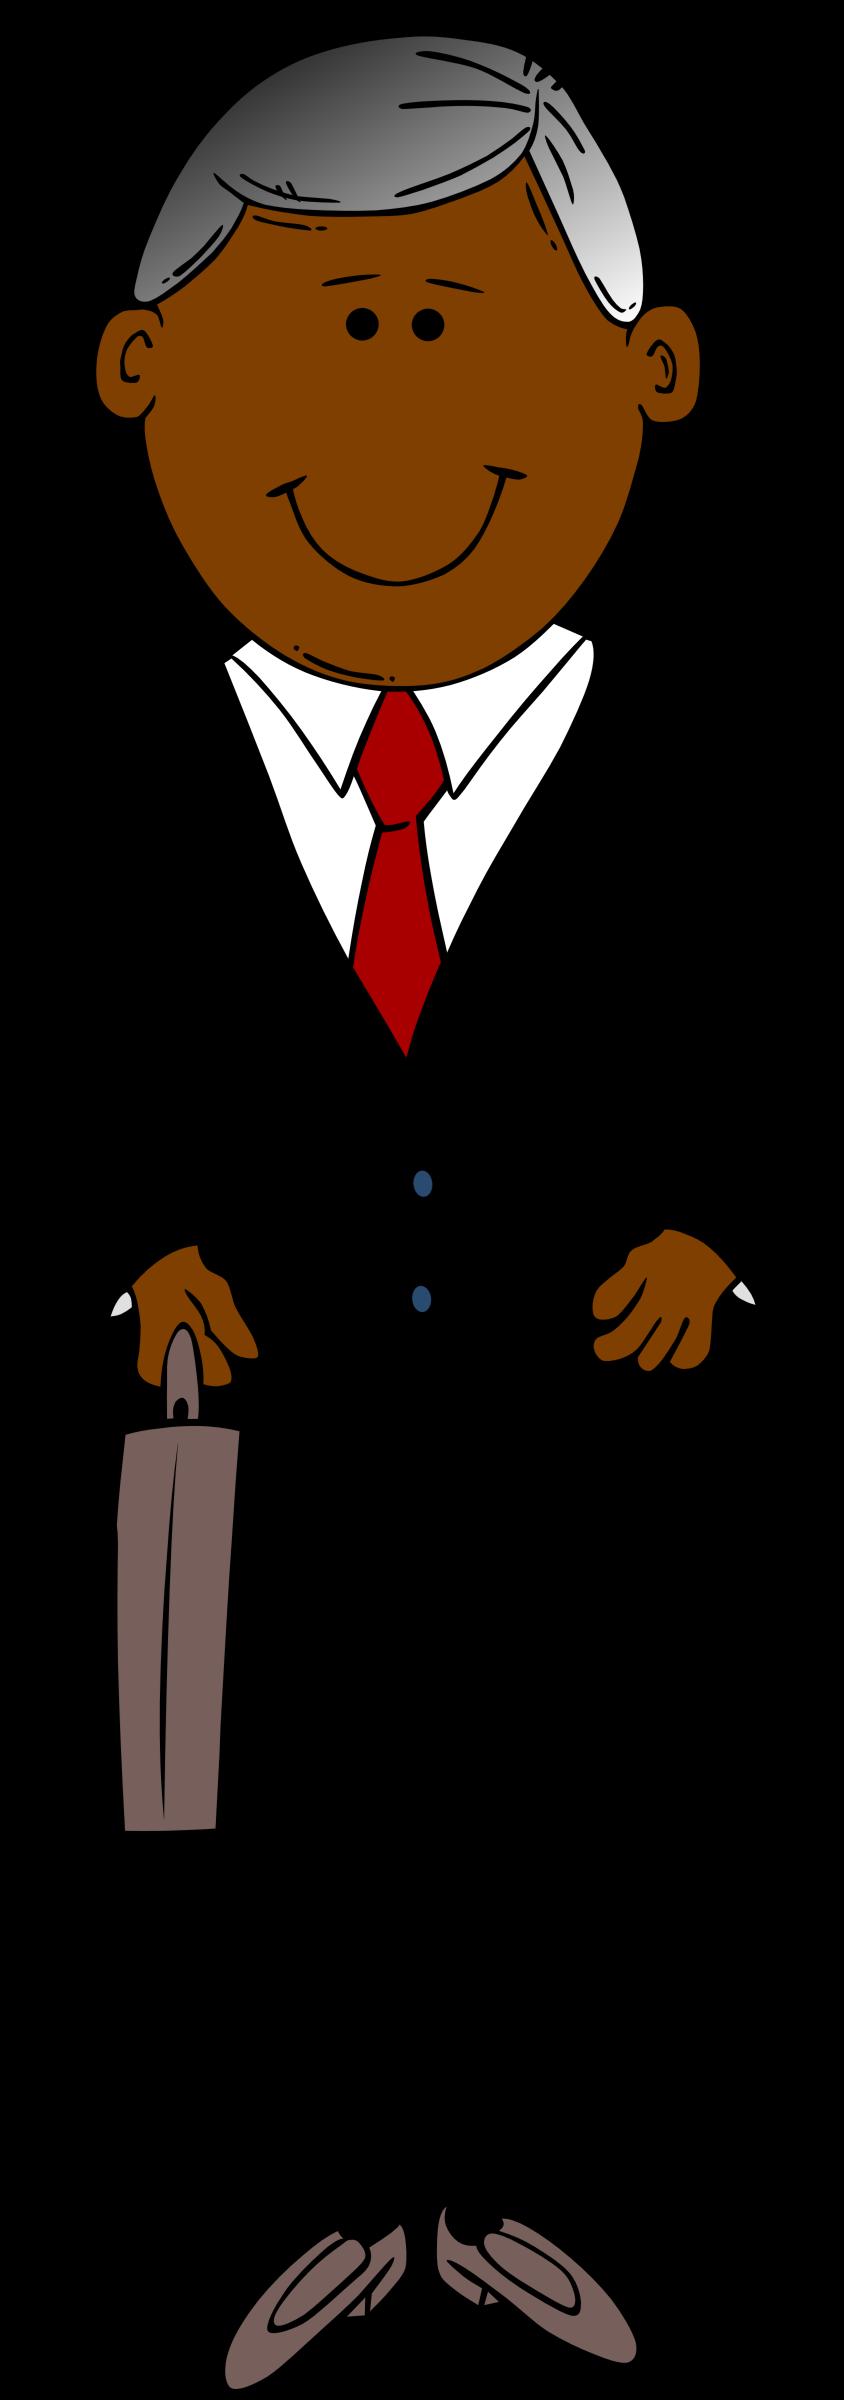 Black men clipart free svg black and white download Business Suit Clipart | Free download best Business Suit Clipart on ... svg black and white download